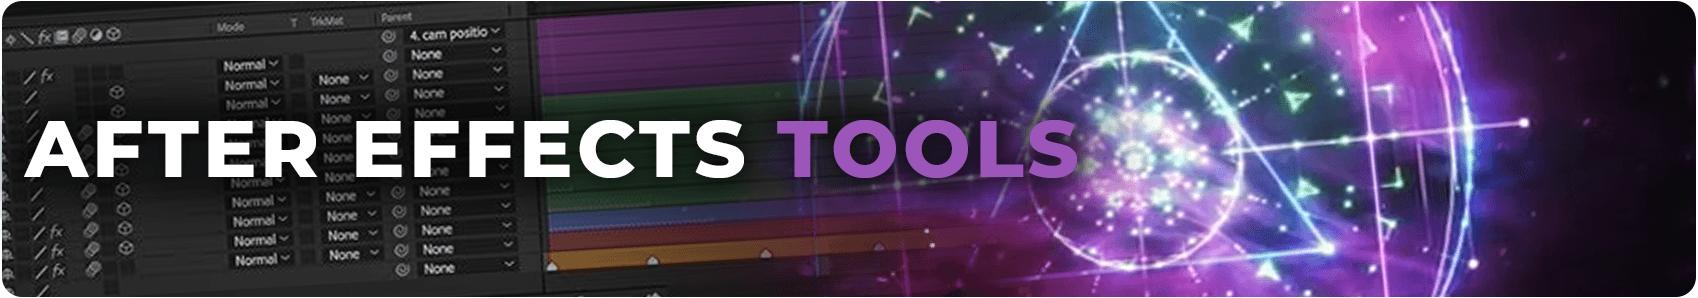 Adobe After Effects plugins header